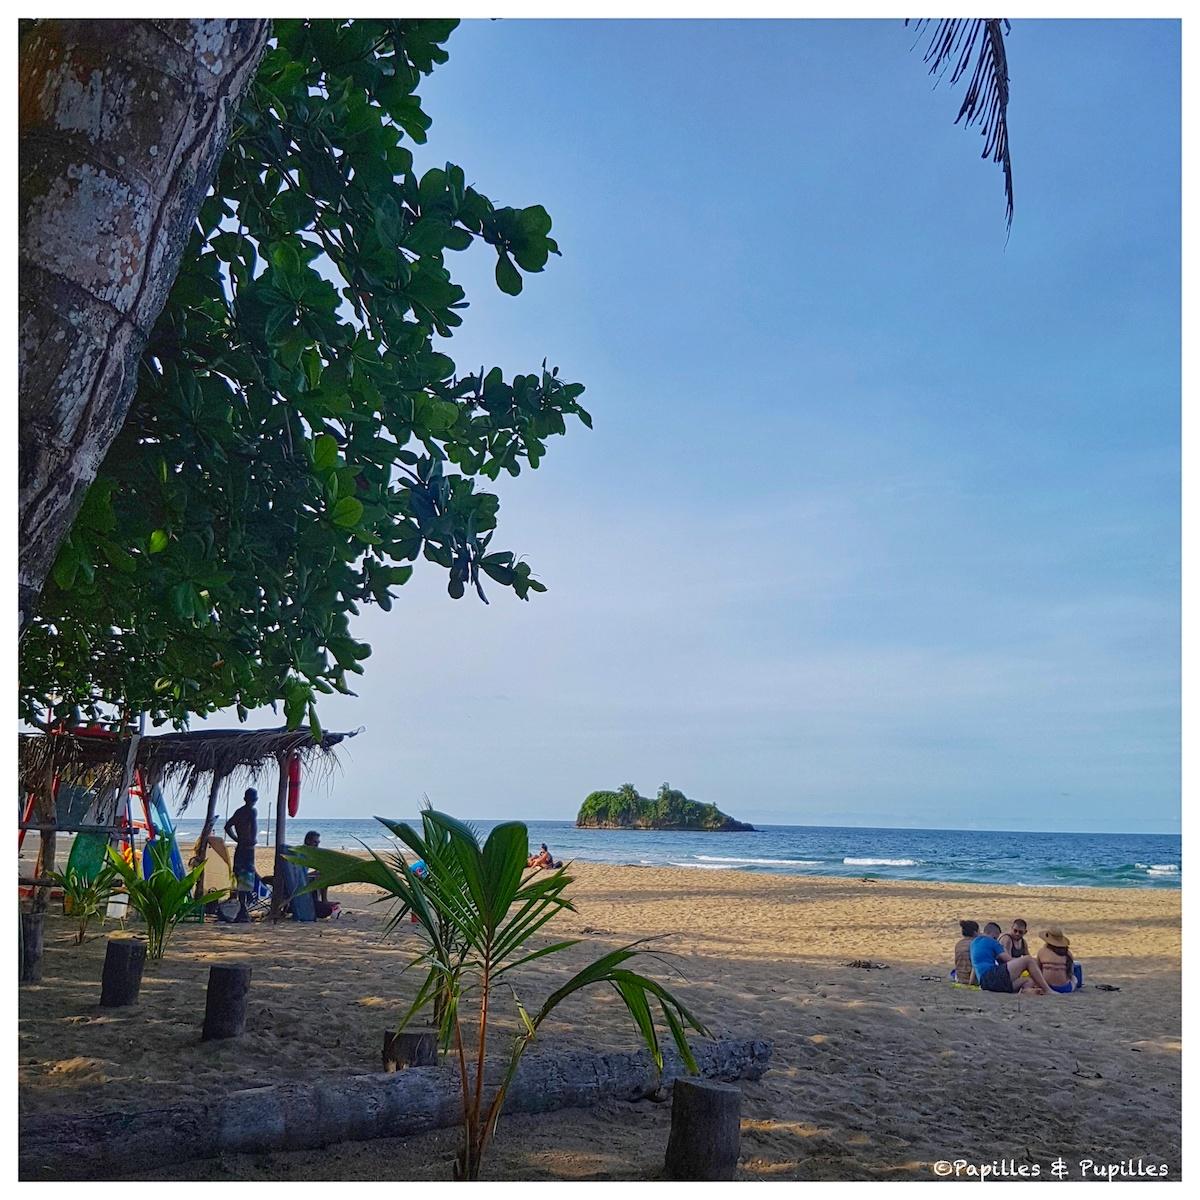 Puerto Viejo - Le Costa Rica côté Caraïbes